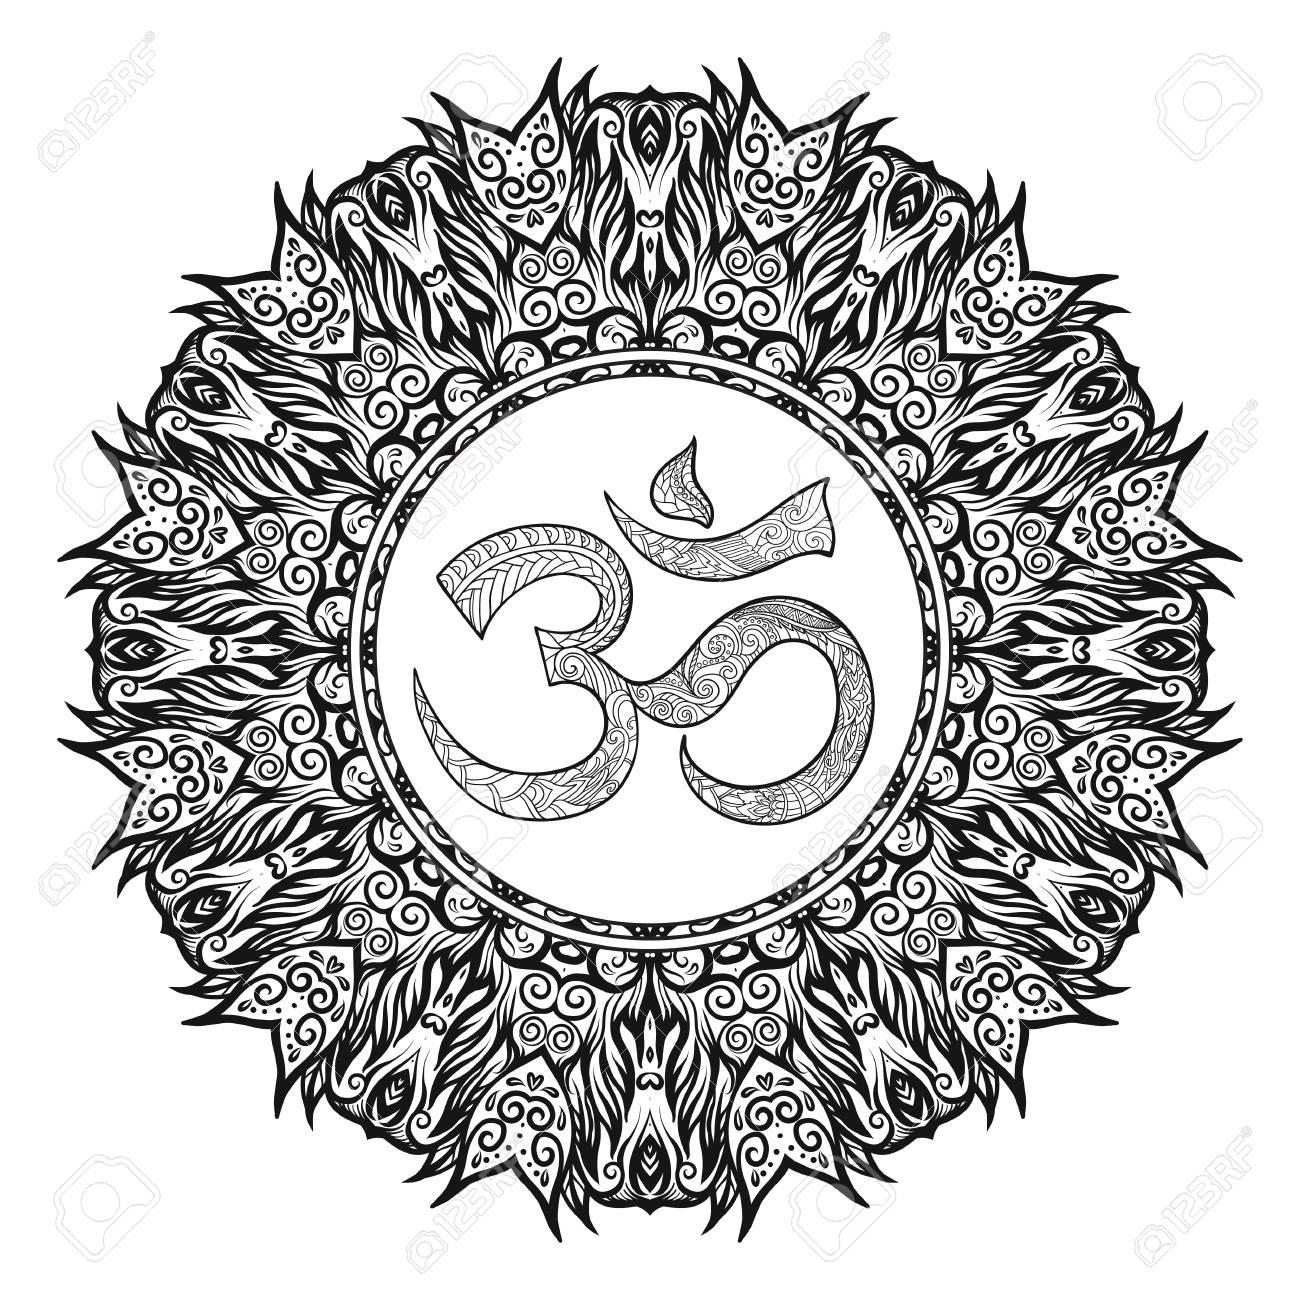 1300x1300 Deco Mandalawith Om Sign, Patterned Design Element, Ethnic Amulet